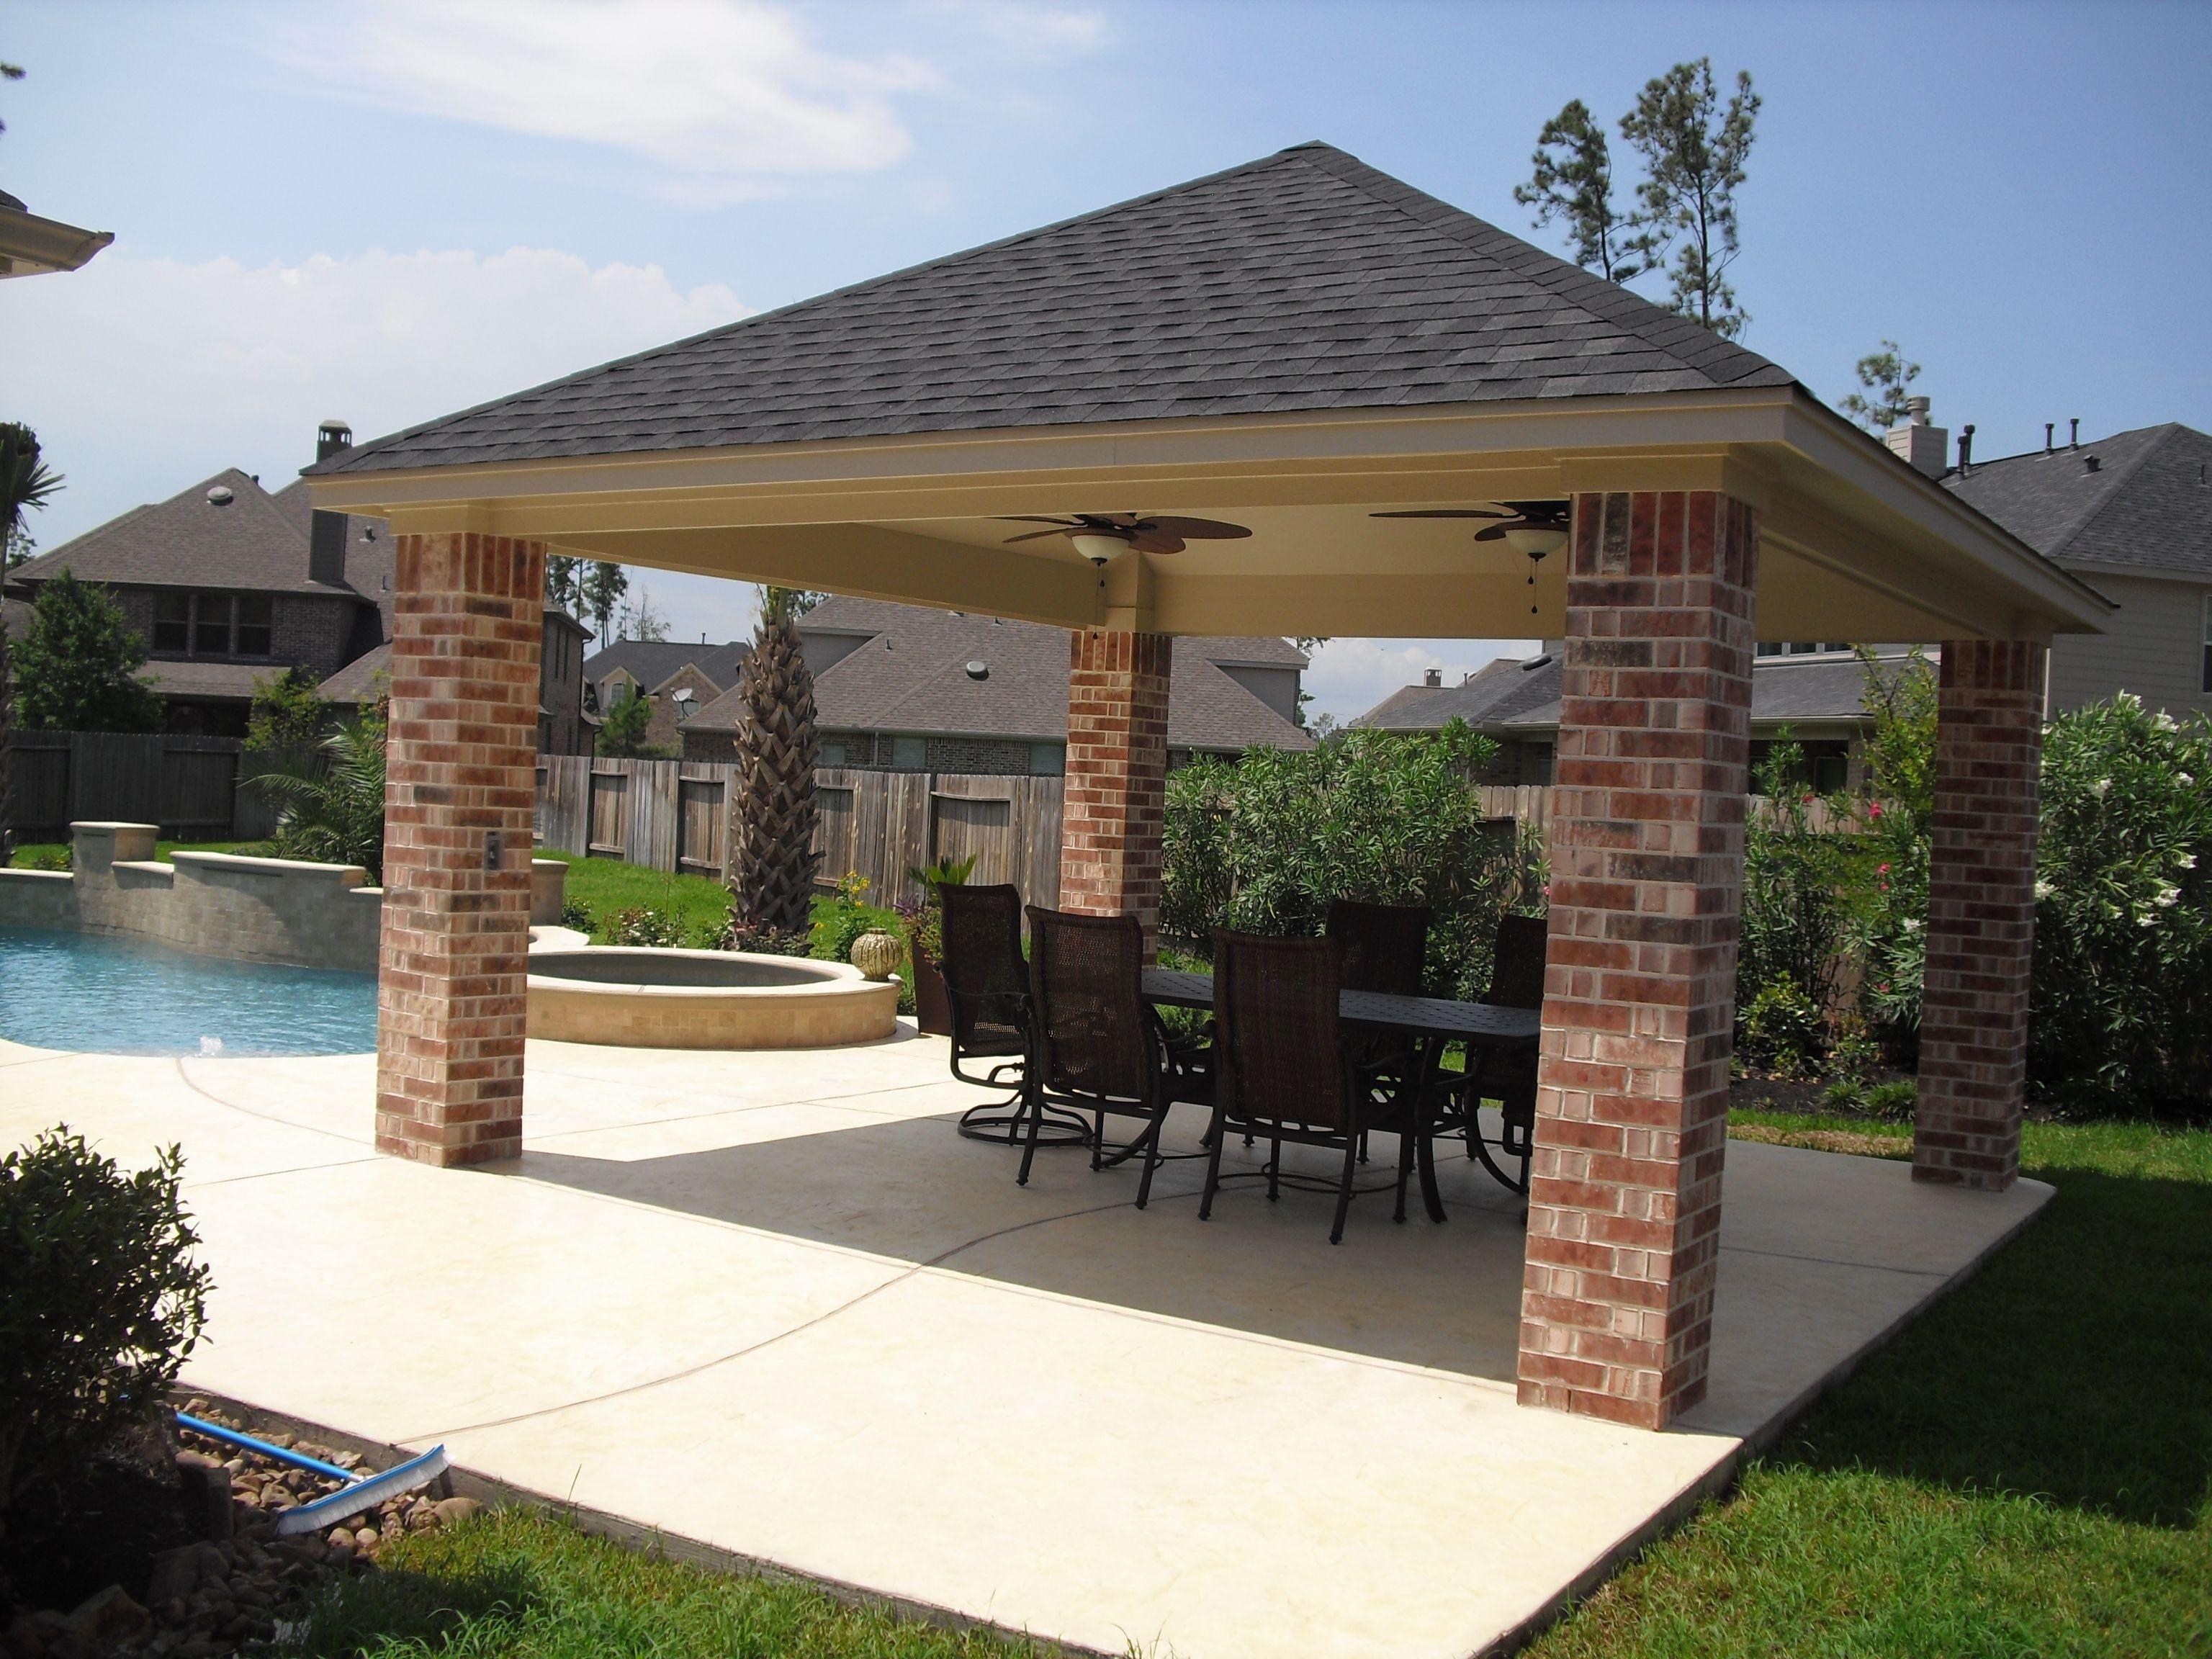 Backyard Porch Ideas On A Budget Patio Makeover Outdoor ... on Patio Cover Ideas On A Budget id=38689